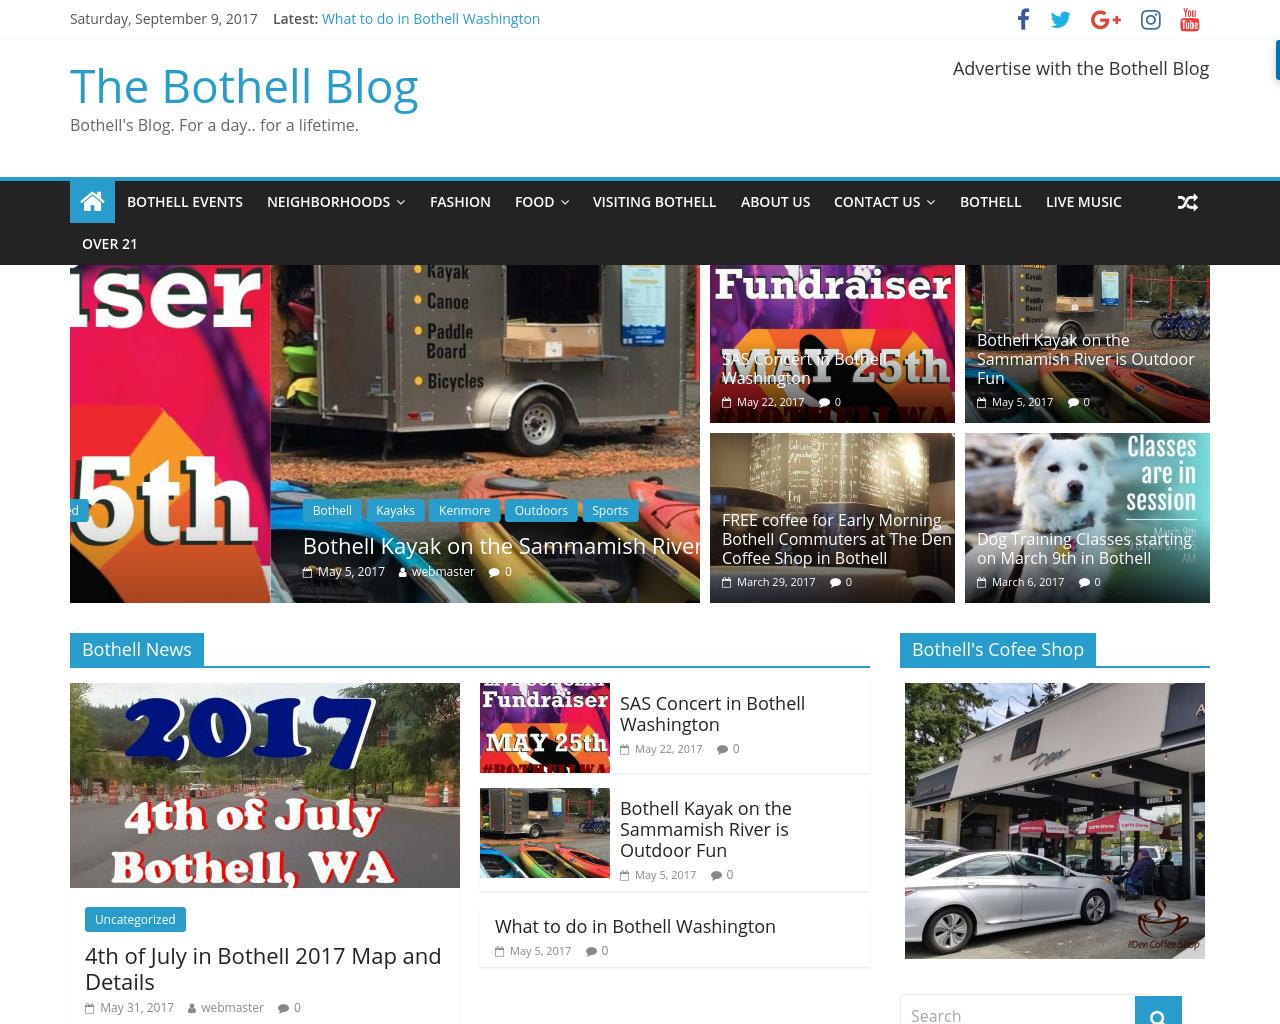 The-Bothell-Blog-Advertising-Reviews-Pricing